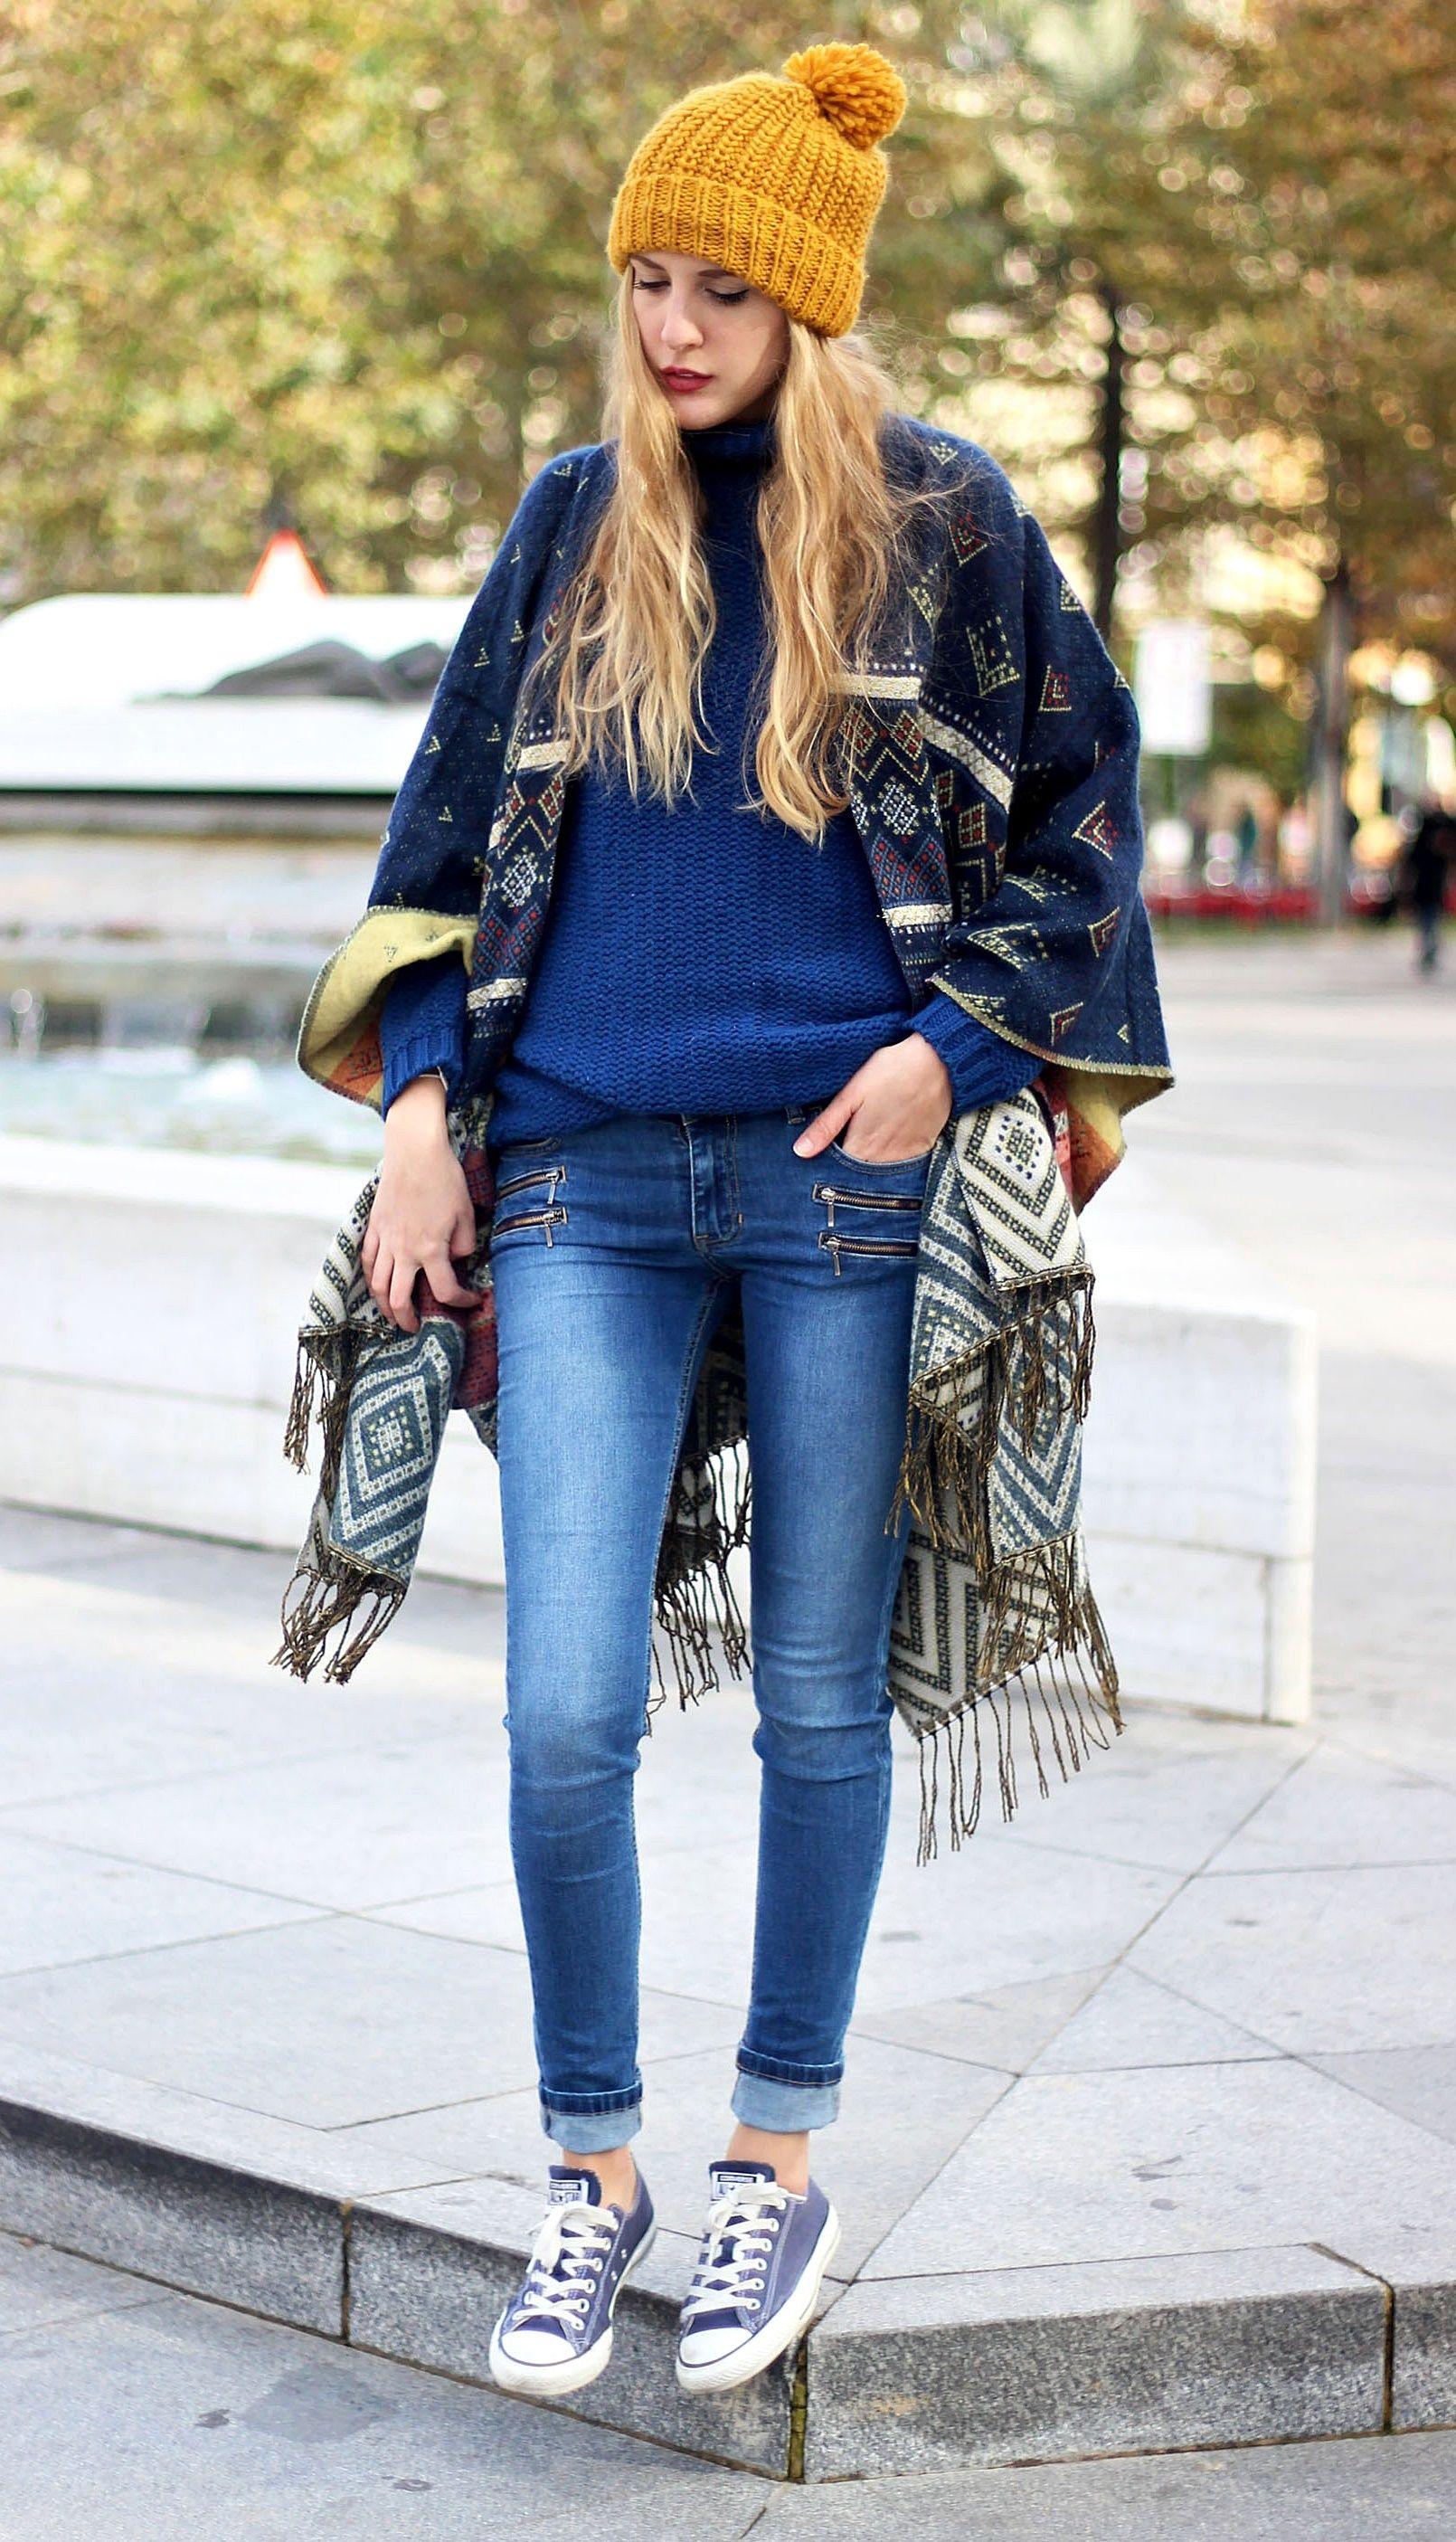 Poncho http://www.deardiary-fashion.com/poncho/ #ootd #ethnic #jeans #converse #beanie